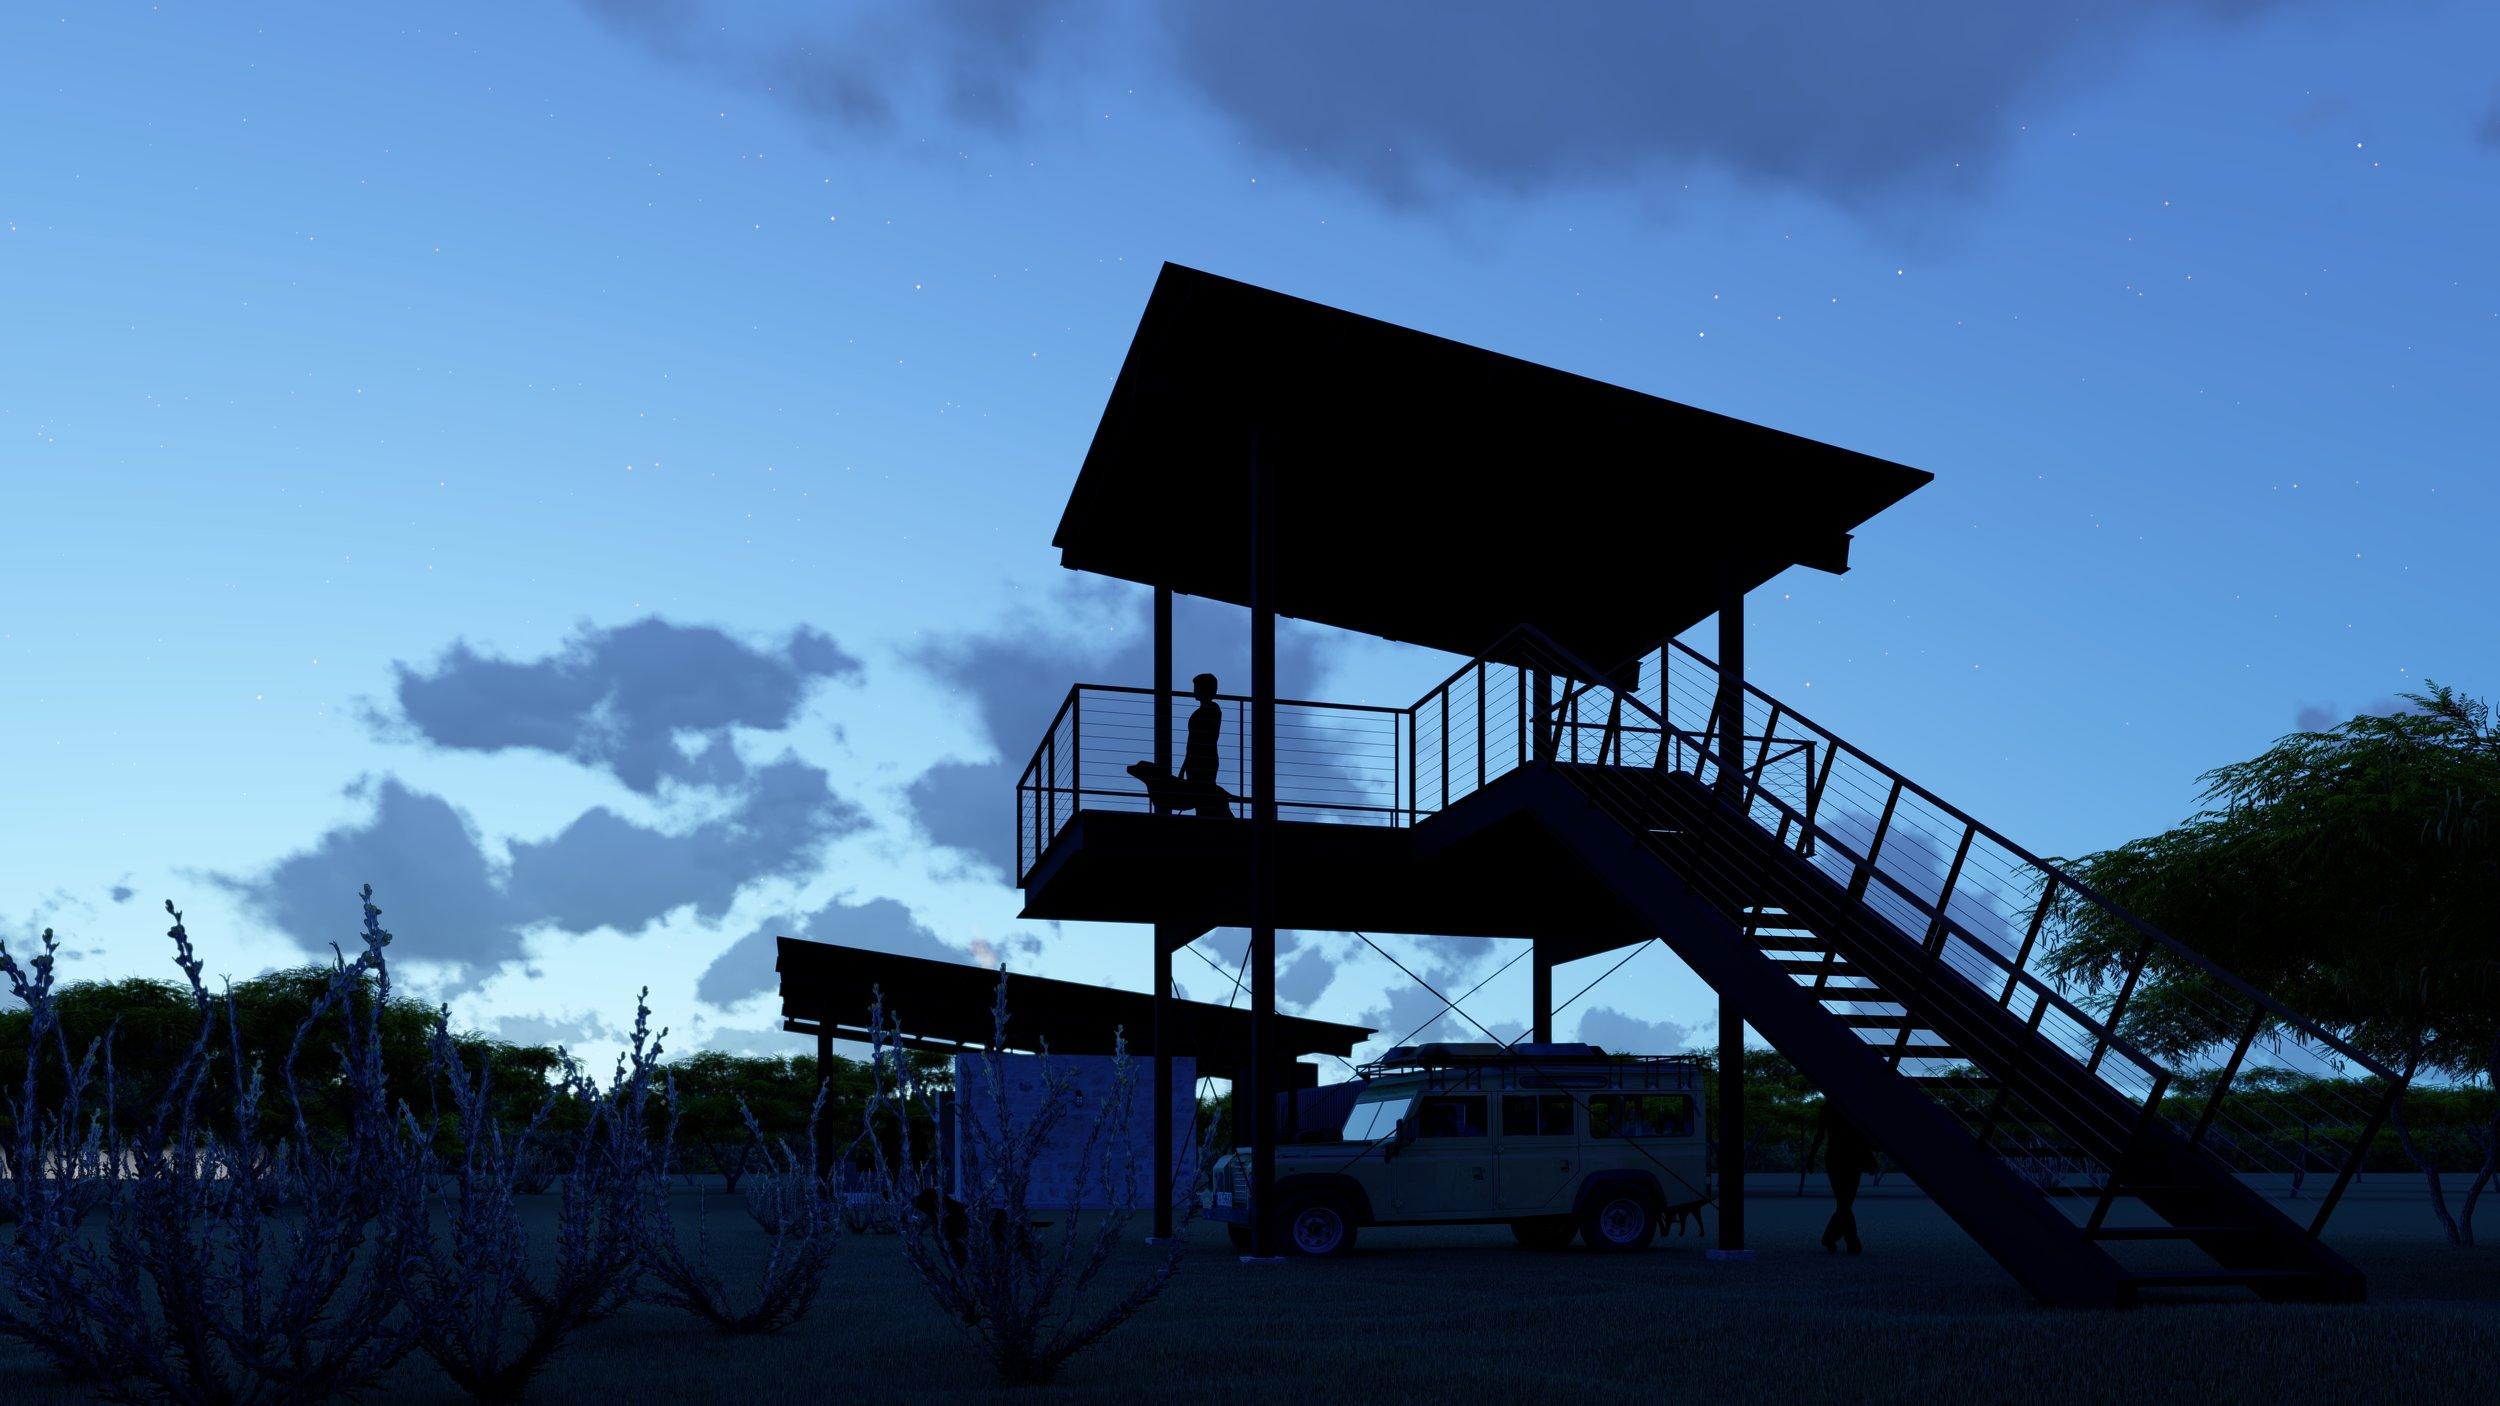 Jeff Garnett Architect_Observation Tower 02 night.jpg